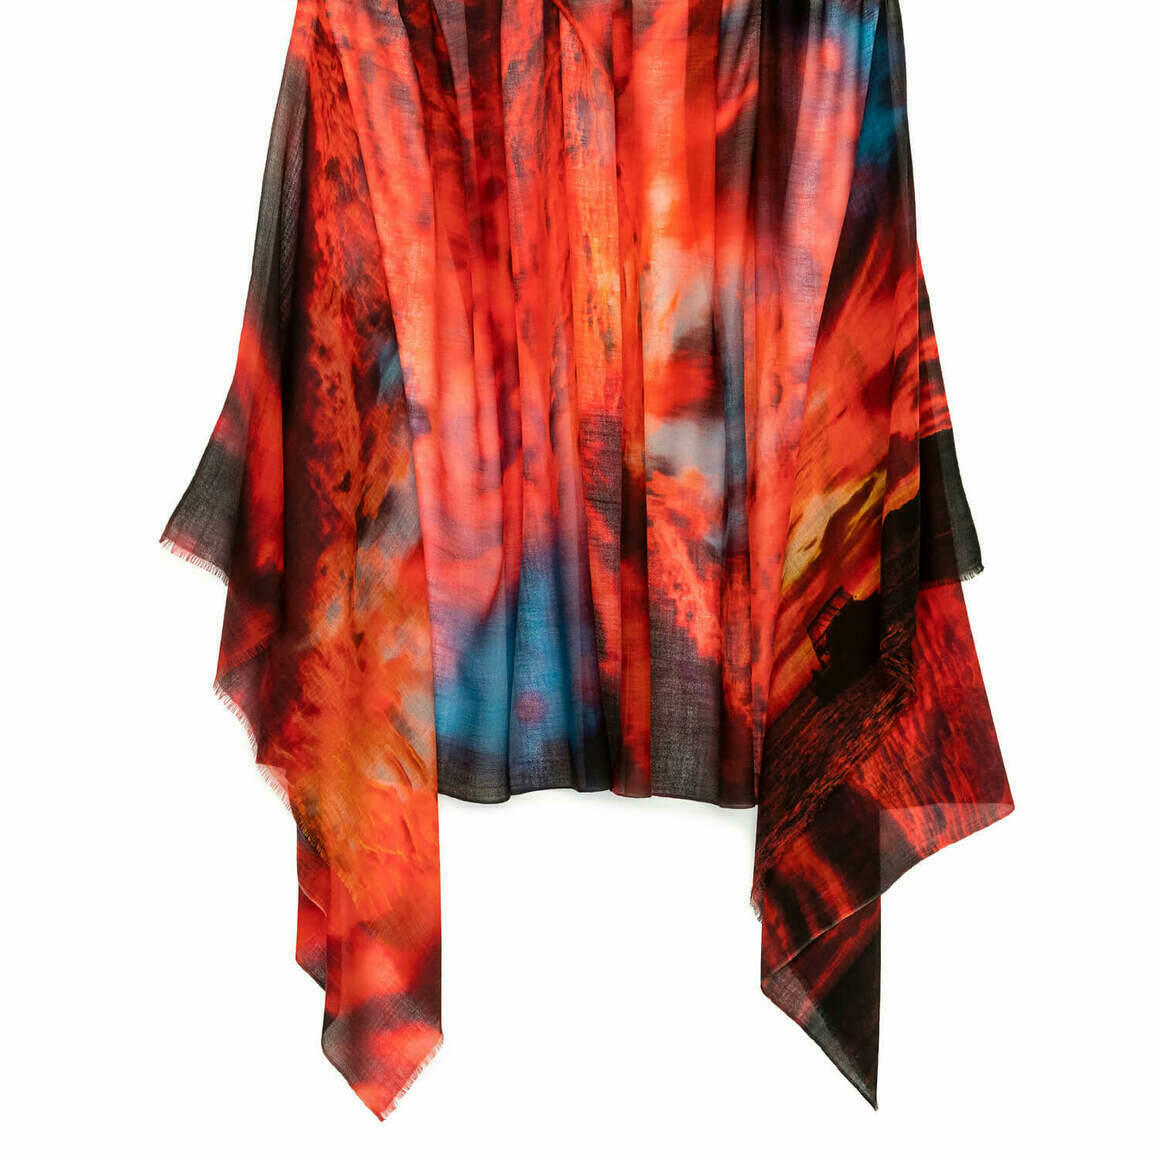 Red Hot Australian Merino Wool & Cashmere Scarf   Trada Marketplace